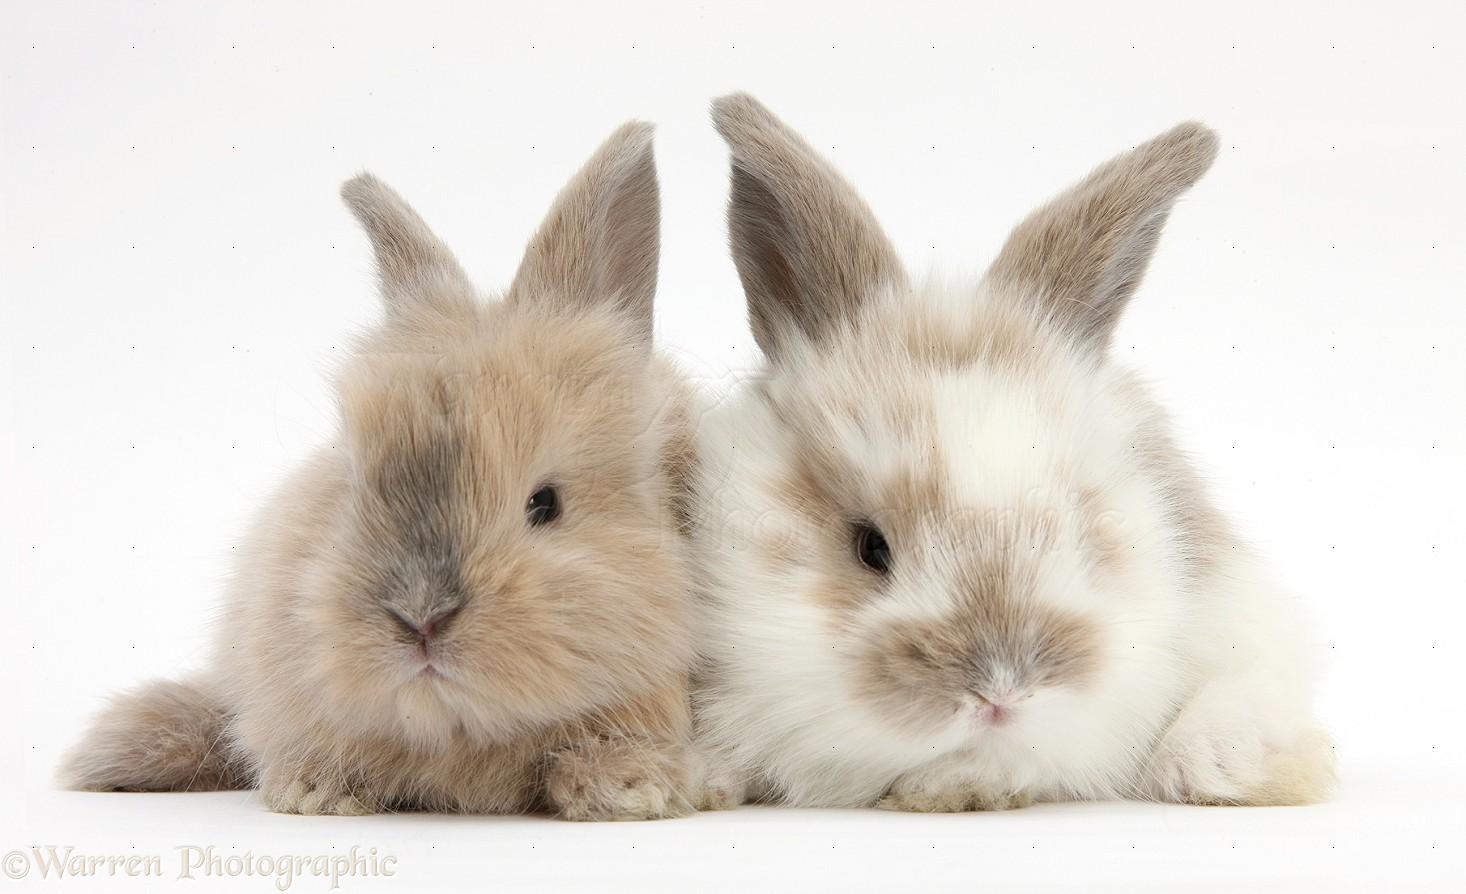 baby lionhead cross rabbits photo wp28890